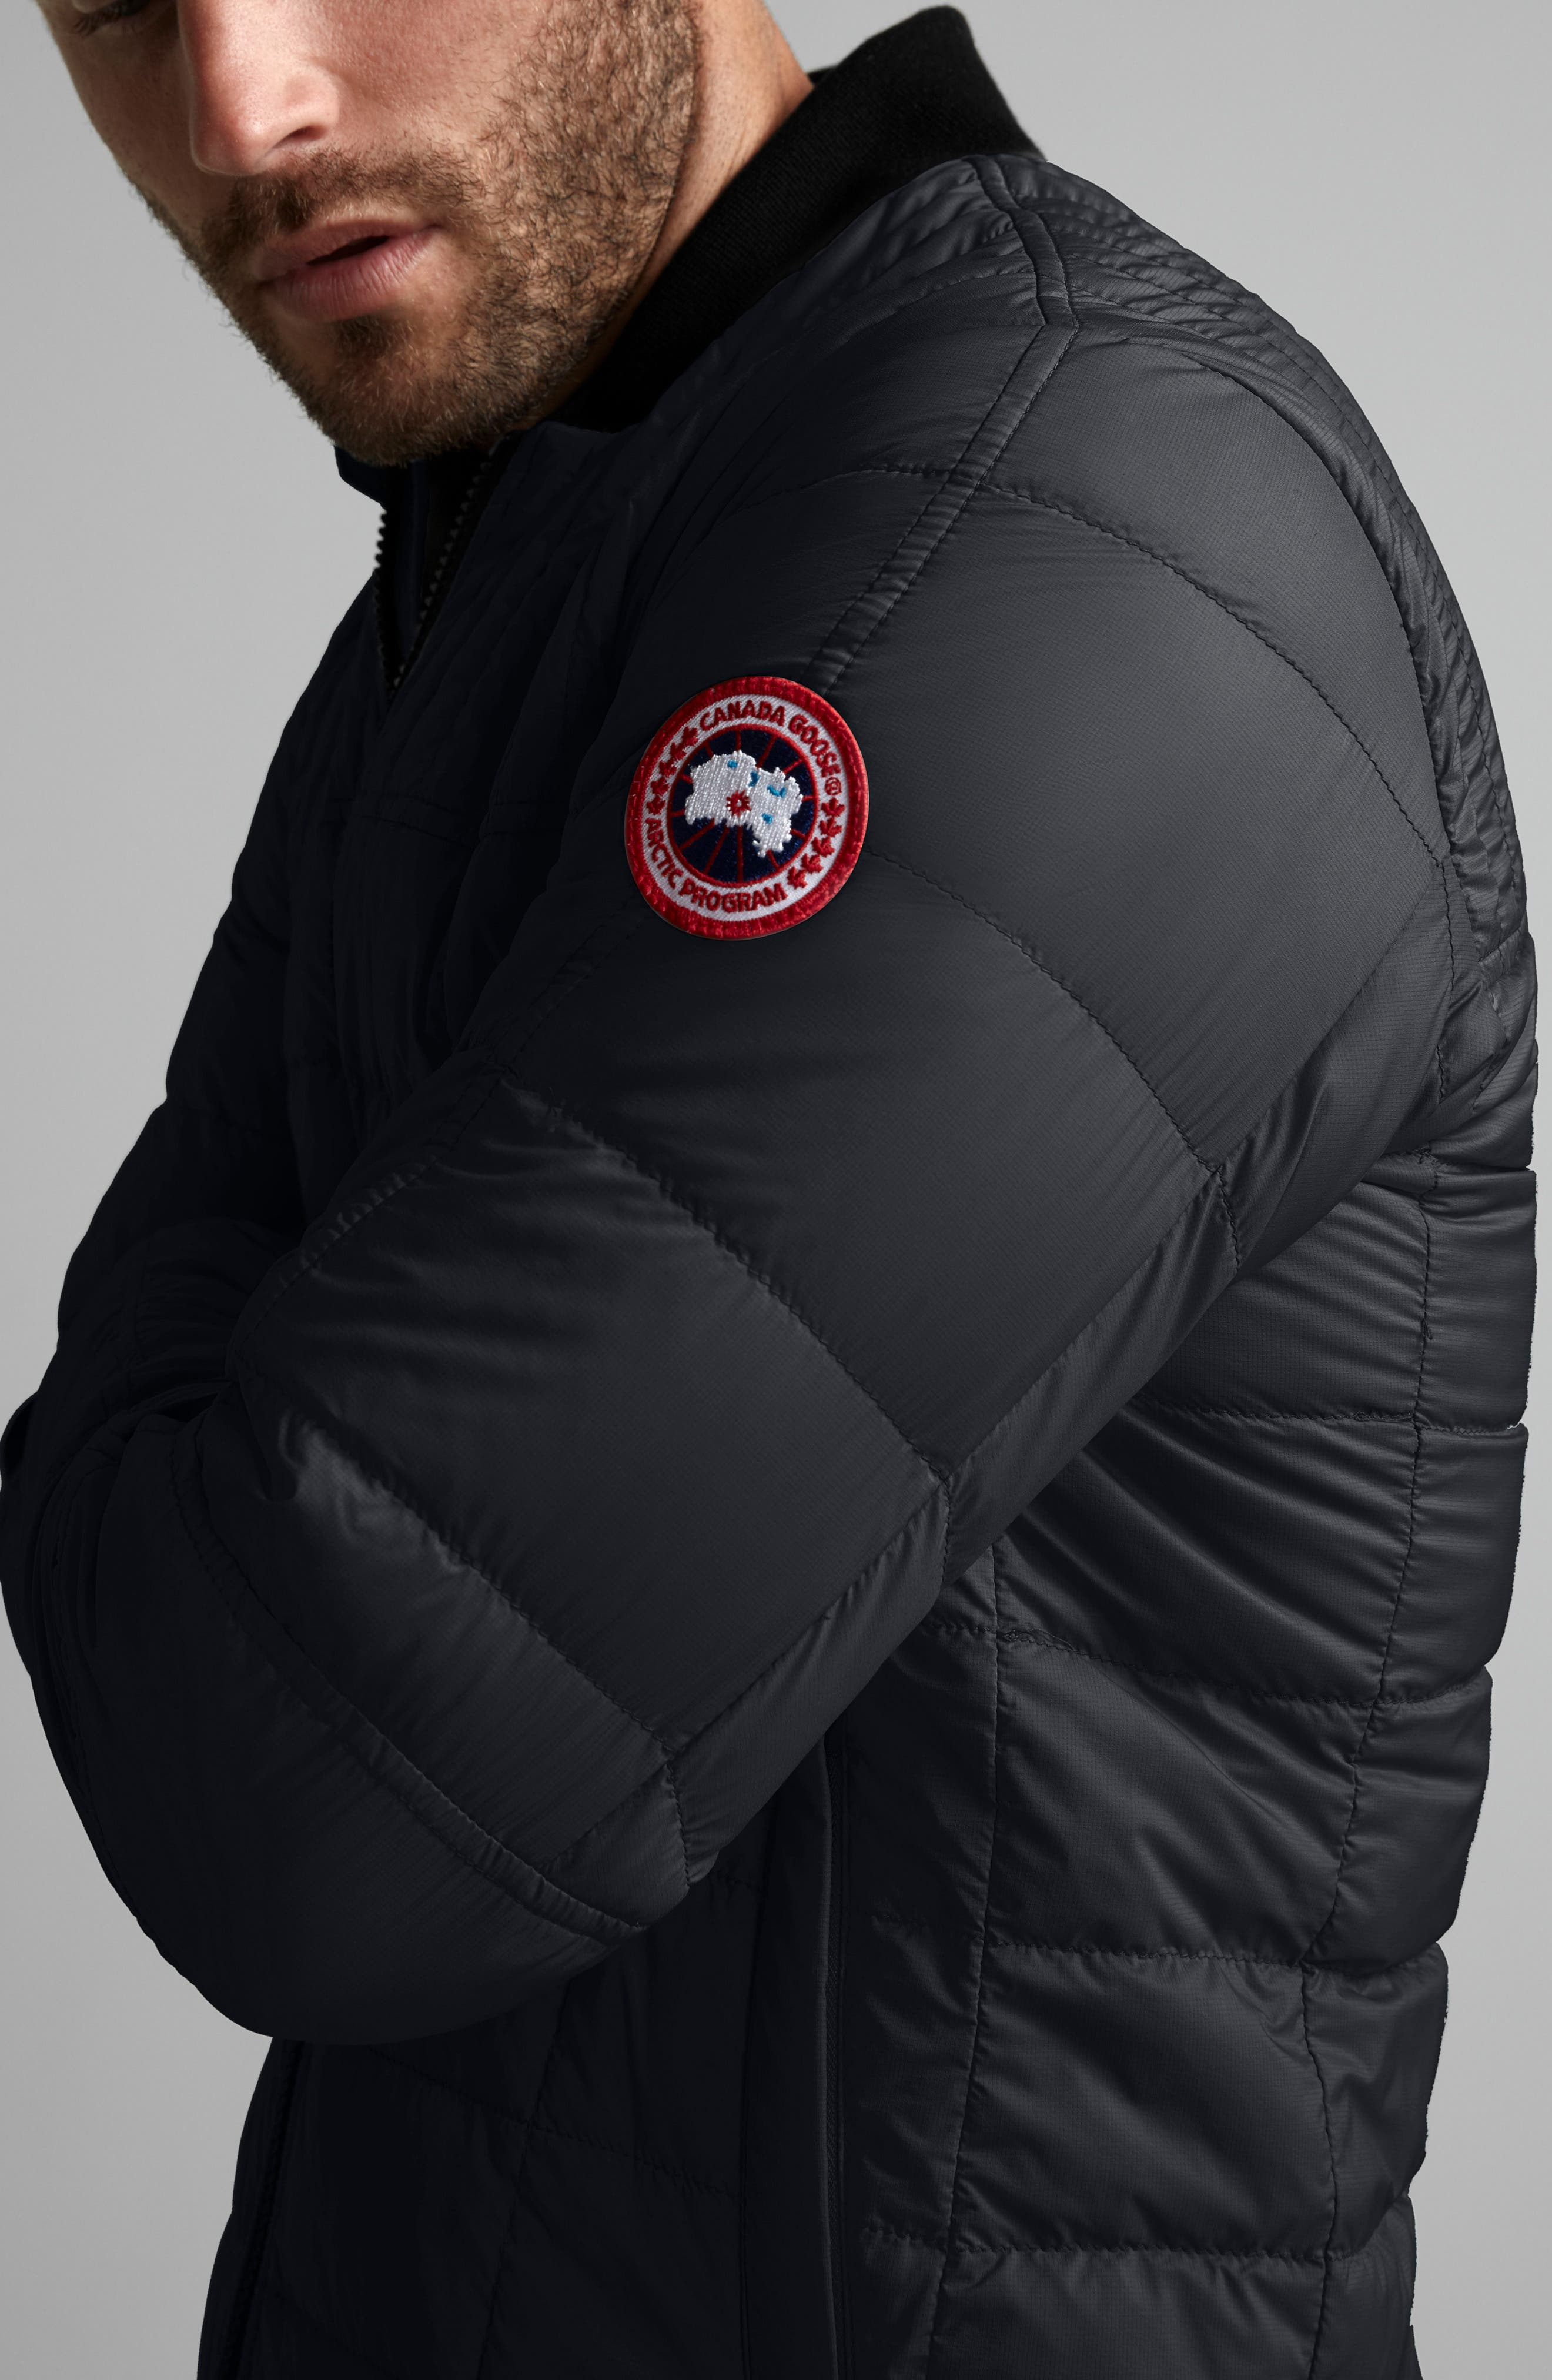 CANADA GOOSE, Dunham Slim Fit Packable Down Jacket, Alternate thumbnail 3, color, 001